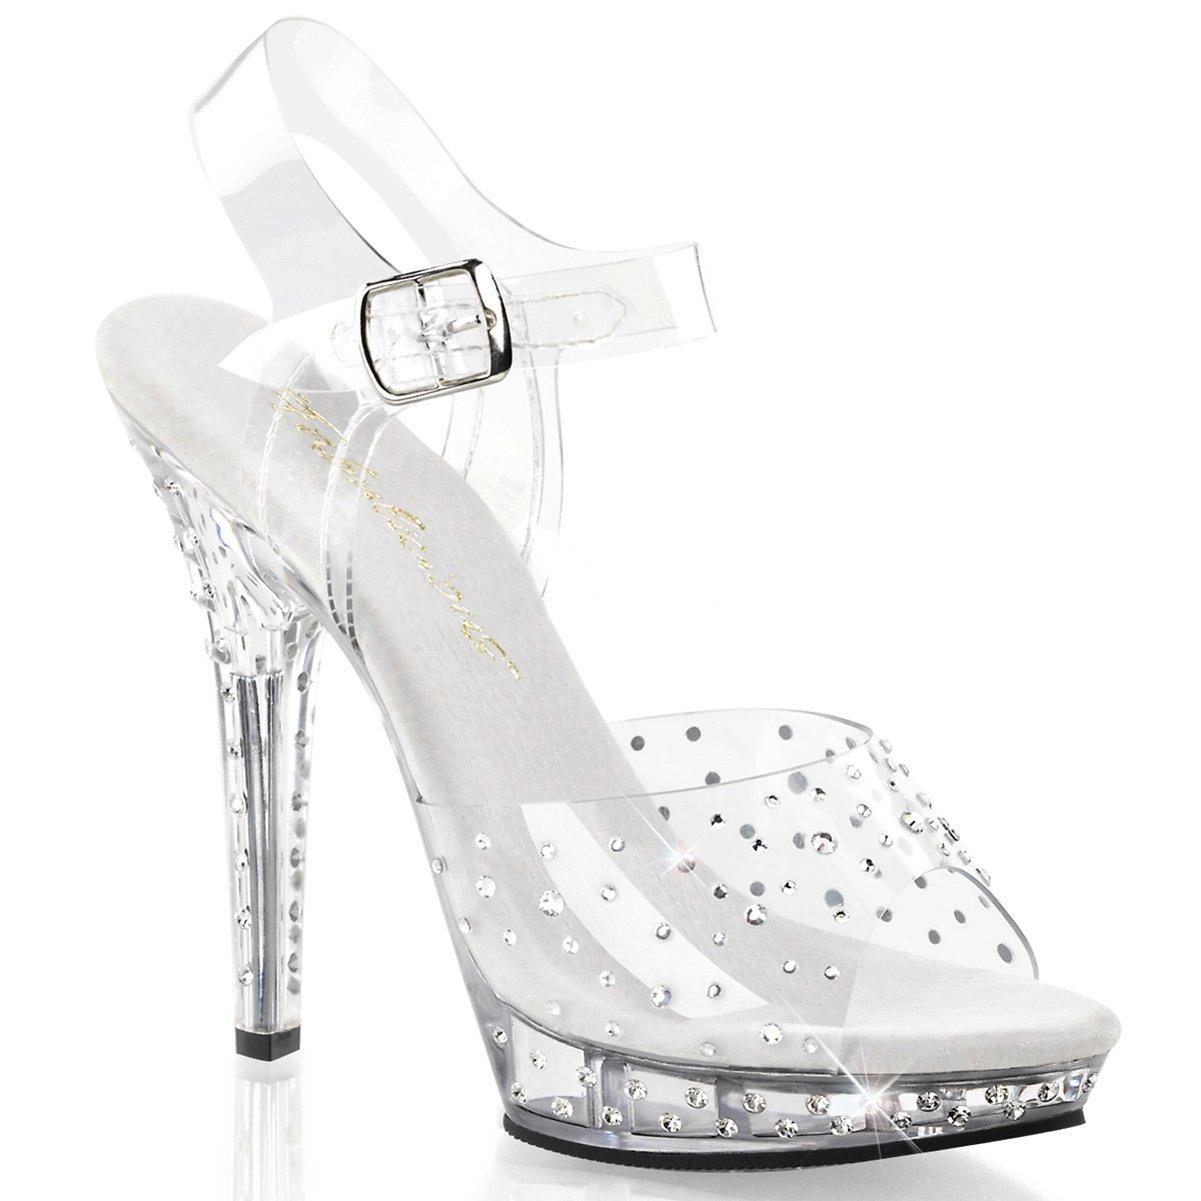 2ad2fe968f9 Womens Wonderful Strappy Rhinestone Sandals Shoes with 5 Inch Clear Heels